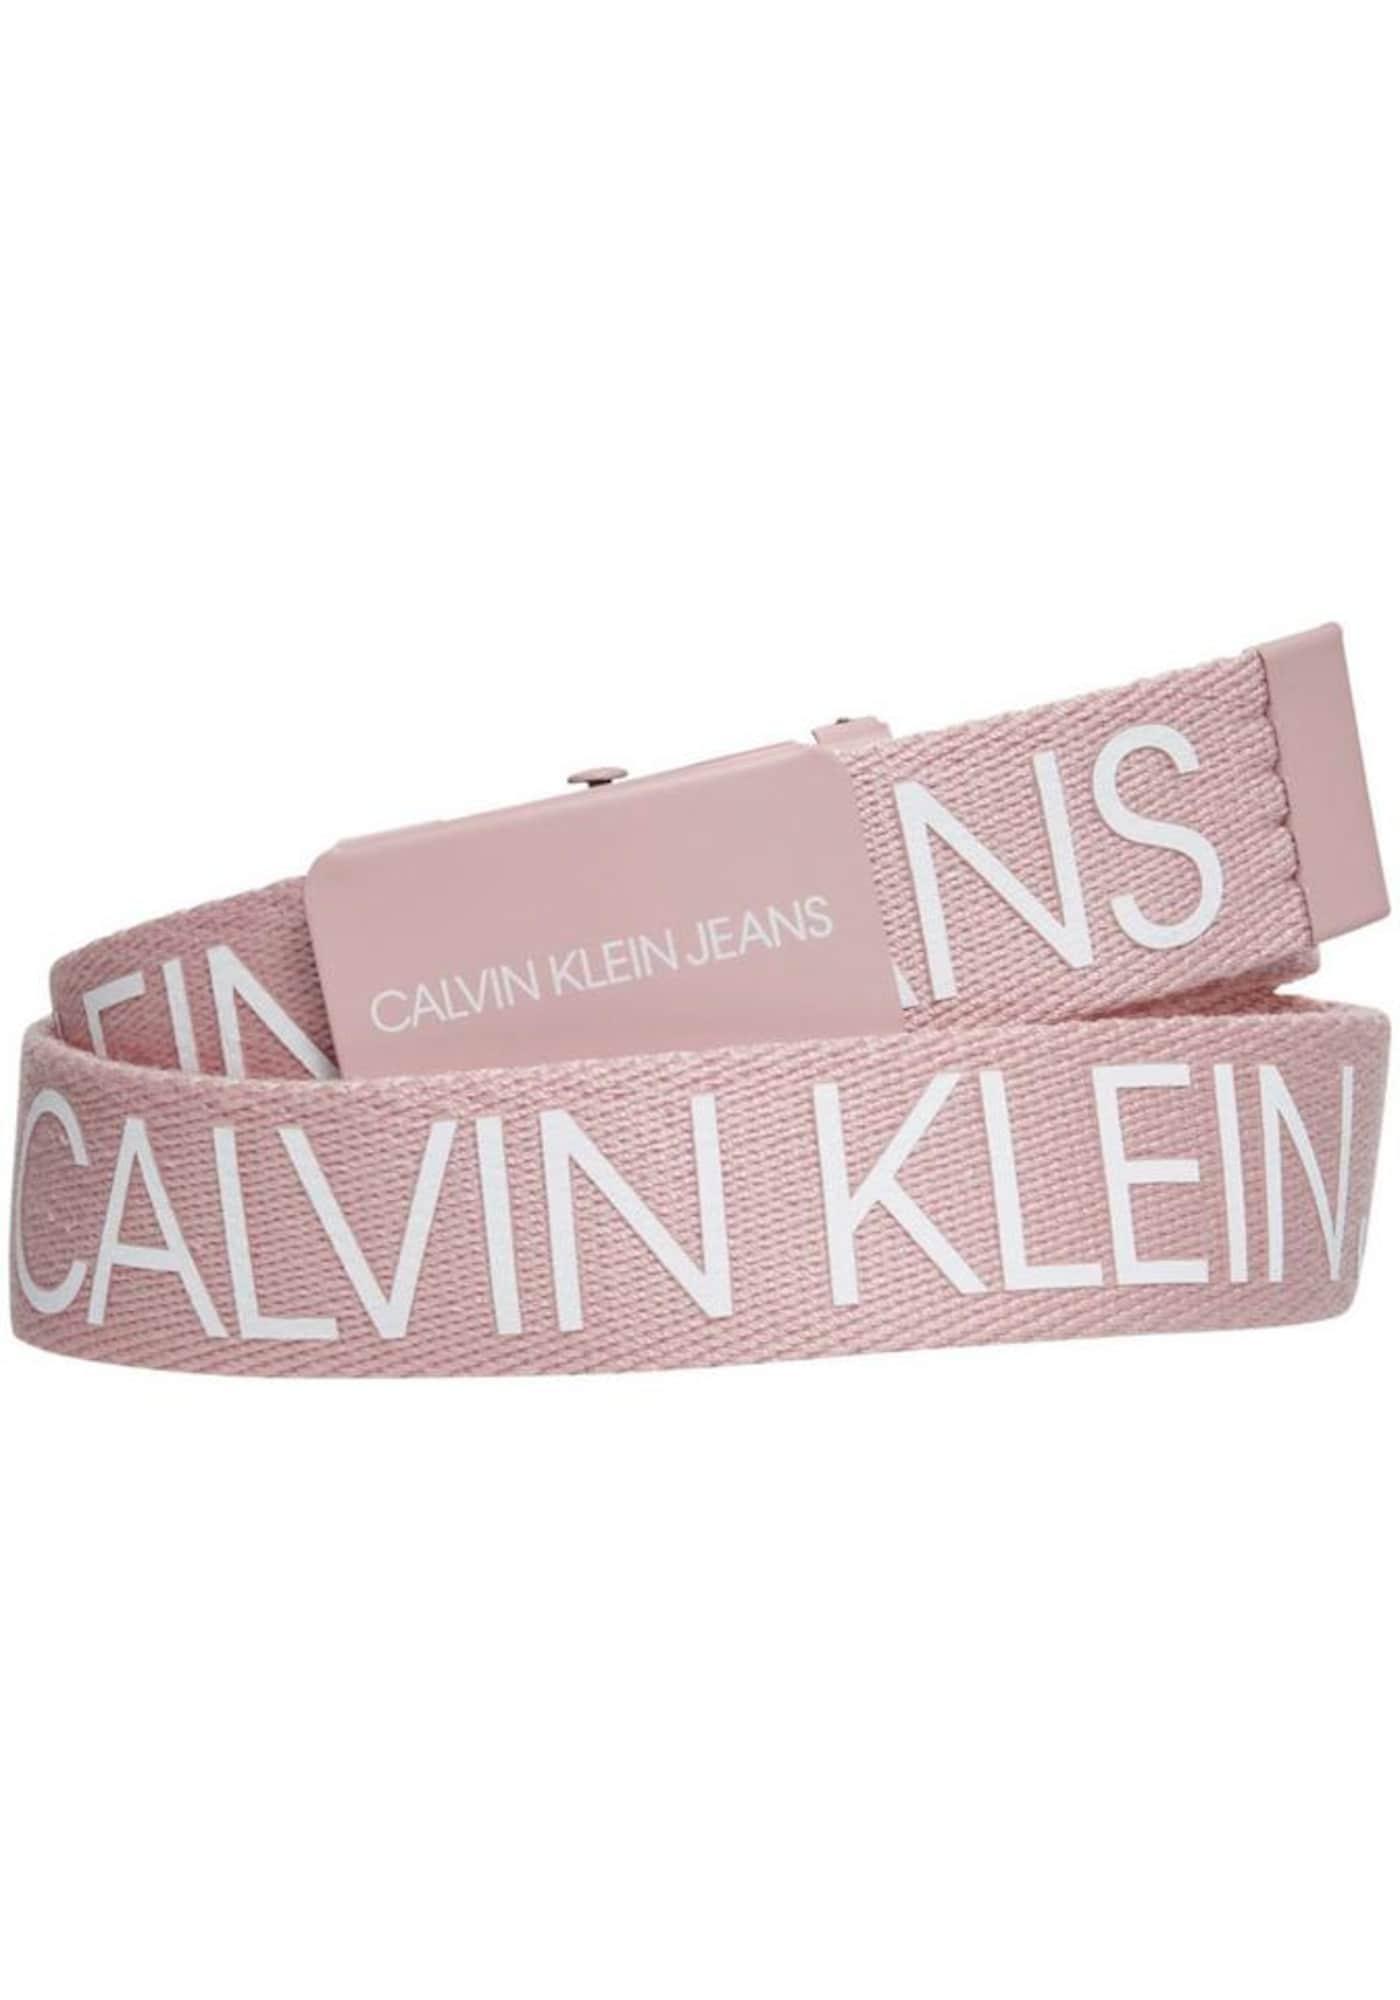 Calvin Klein Jeans Diržas balta / rožinė